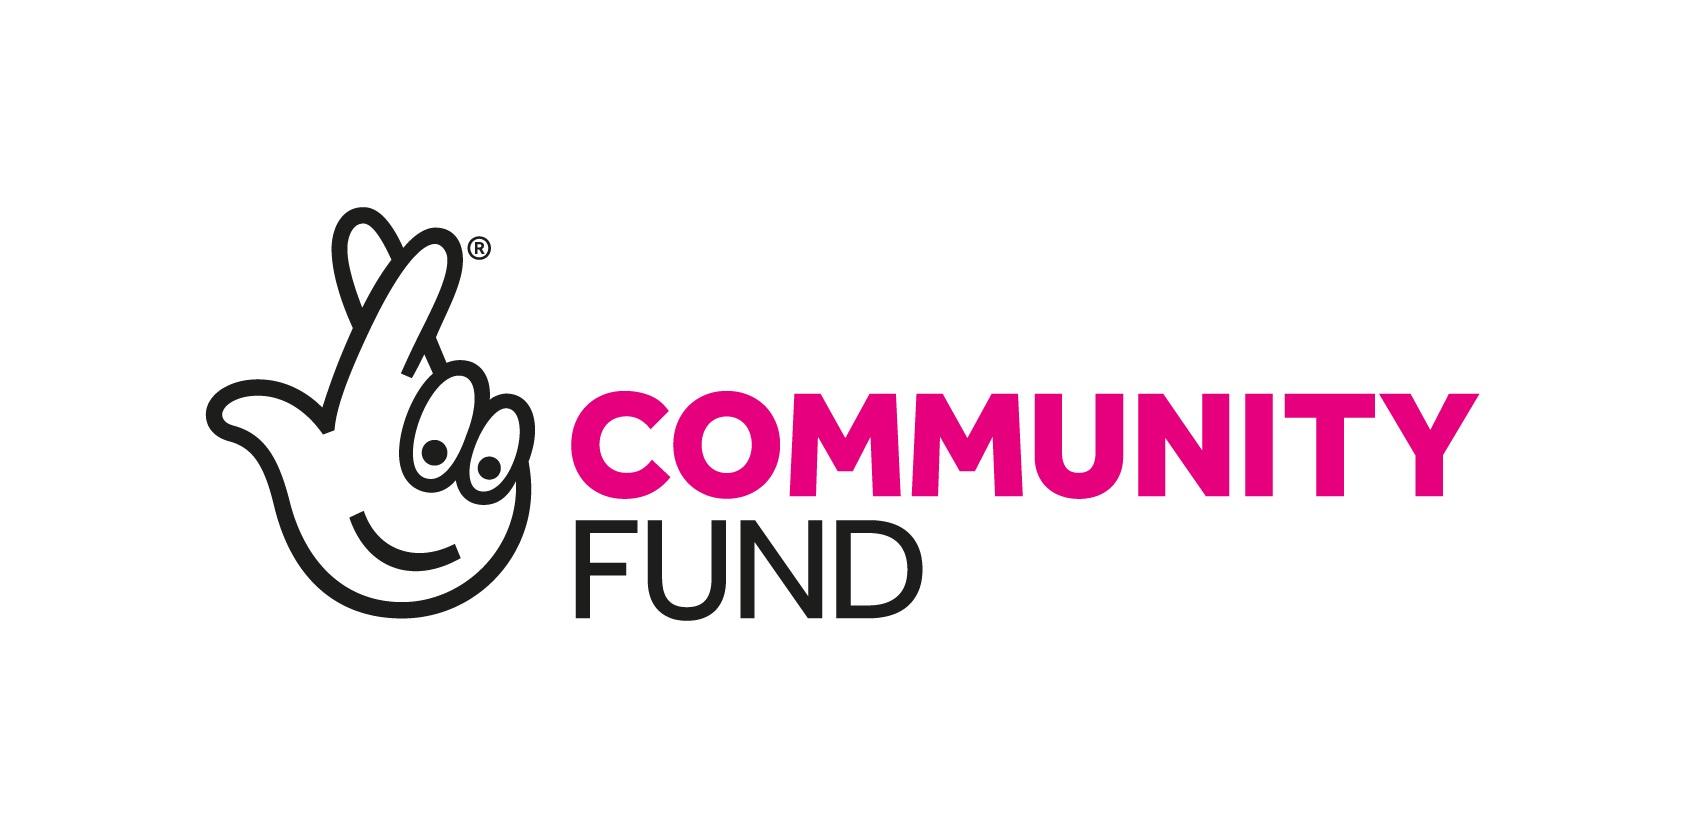 National+Lottery+Community+Fund+digital-white-background.jpg